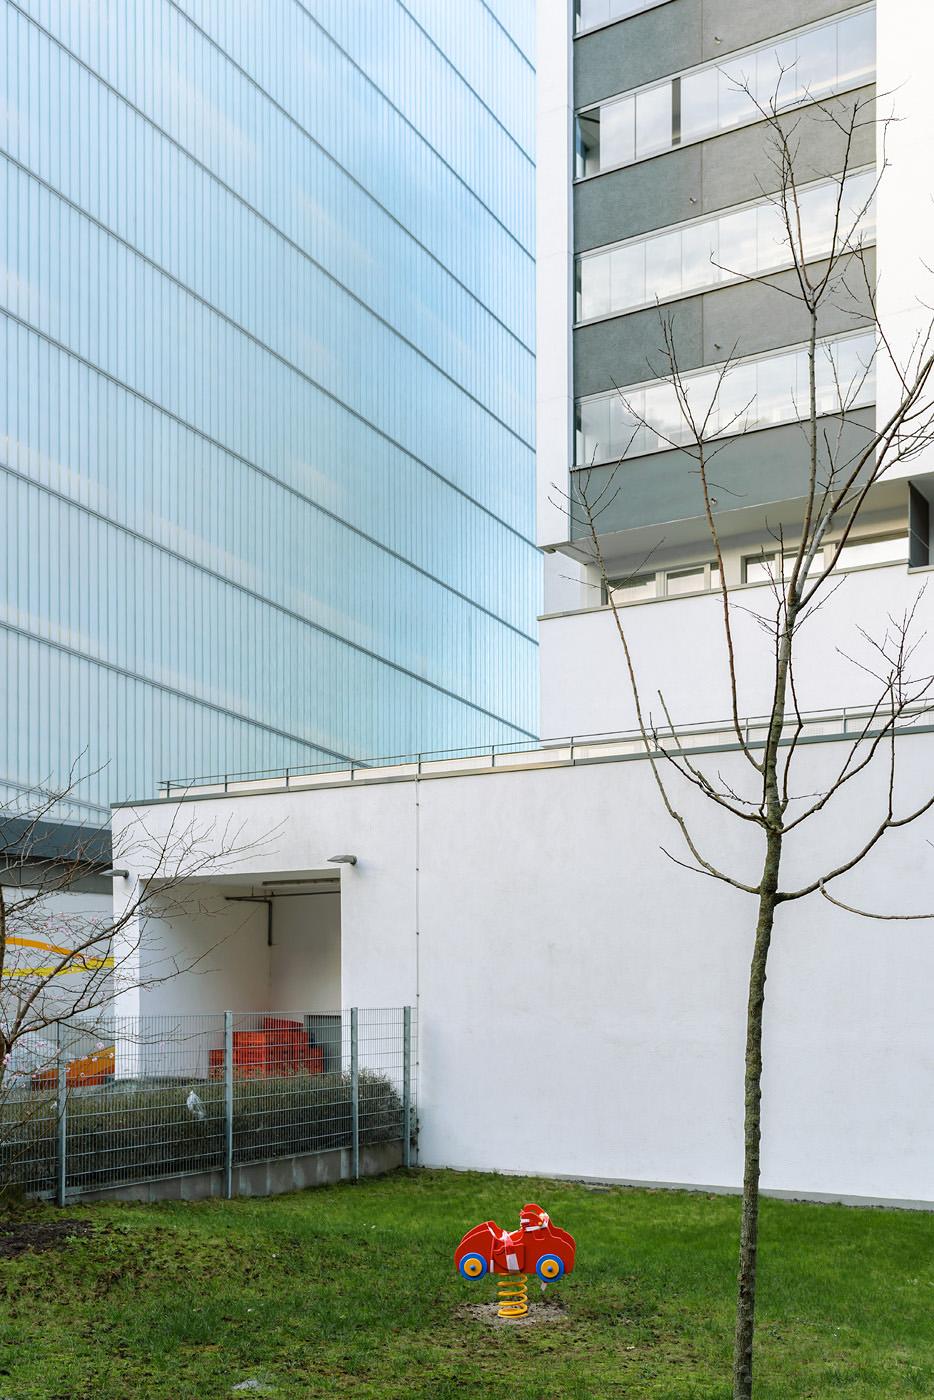 2Spielplatz Ikea-1858.jpg